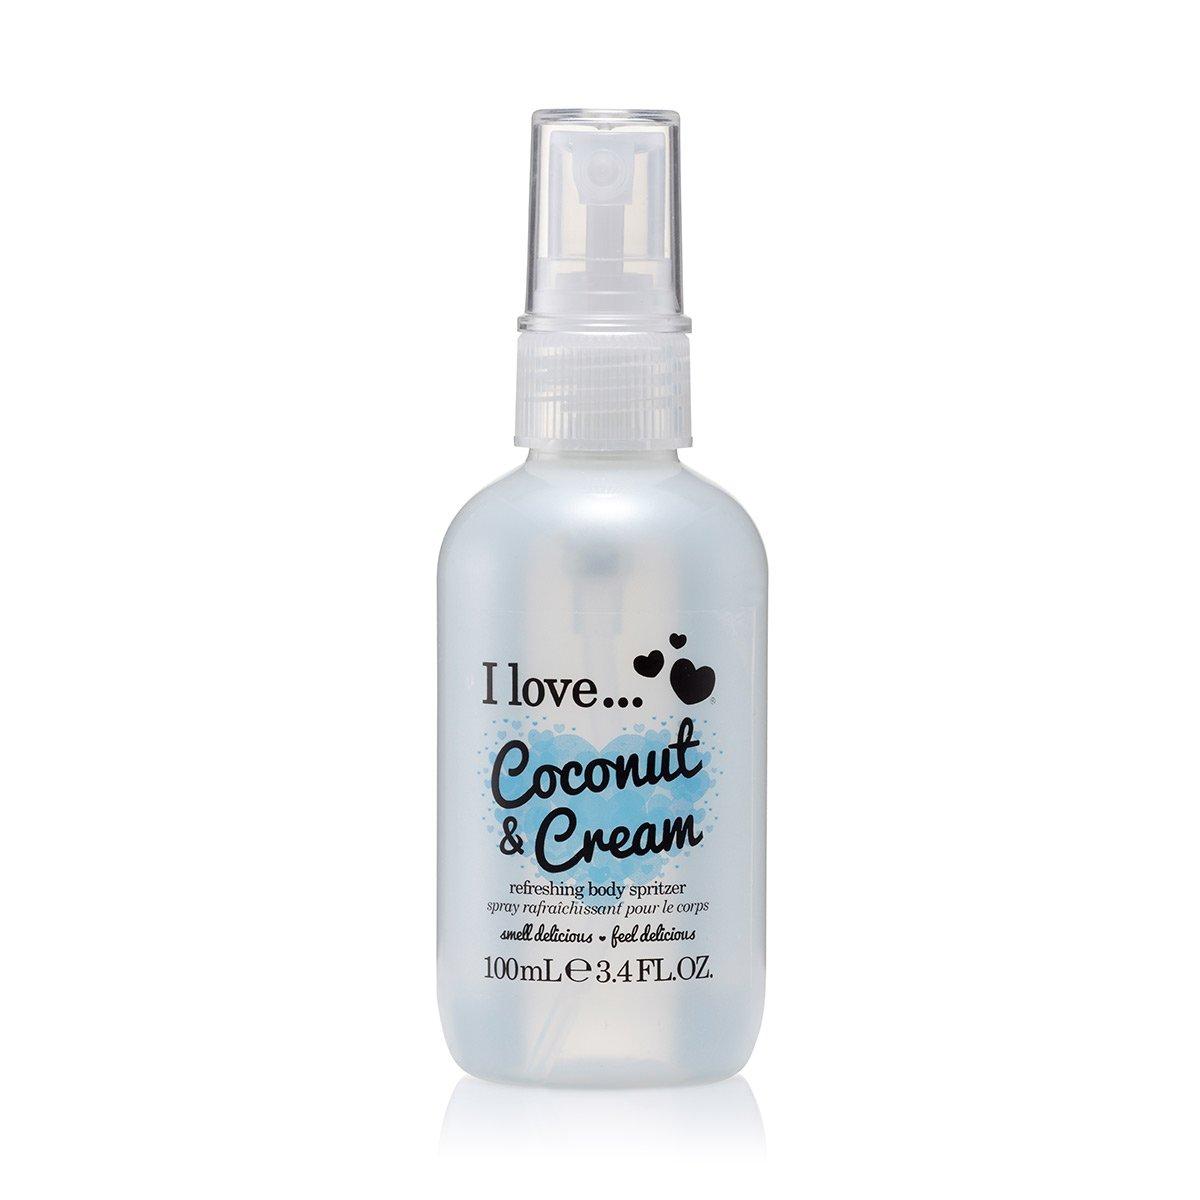 I Love Coconut Cream Refreshing Body Spritzer 100ml Amazonco Holiday Series Hawaii Breeze 200ml Beauty